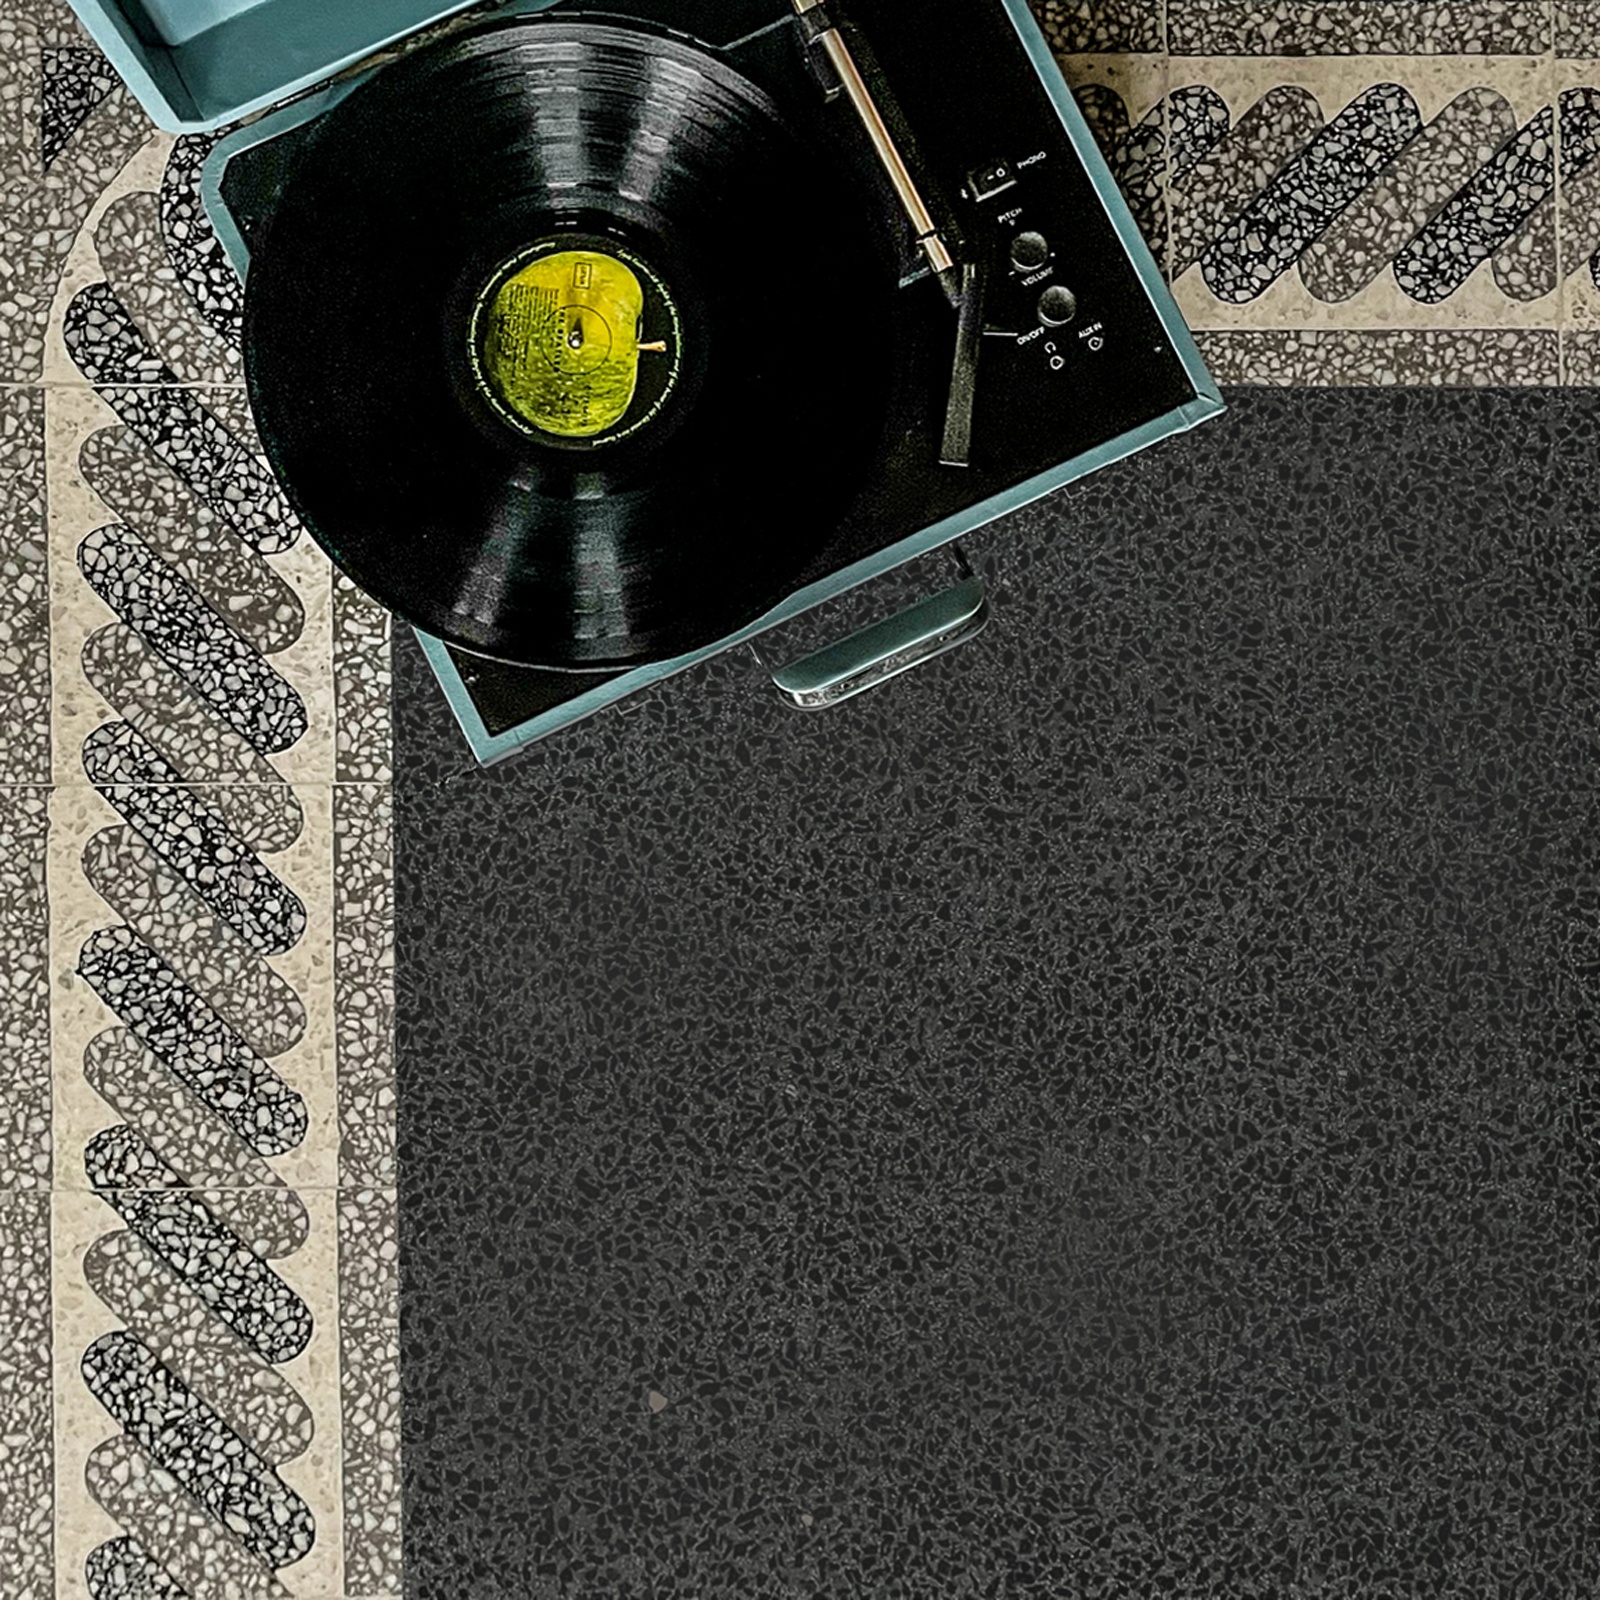 zementfliesen-terrazzofliesen-kreidefarbe-terrazzo-fugenlos-nr.T00552-viaplatten | N° T00552